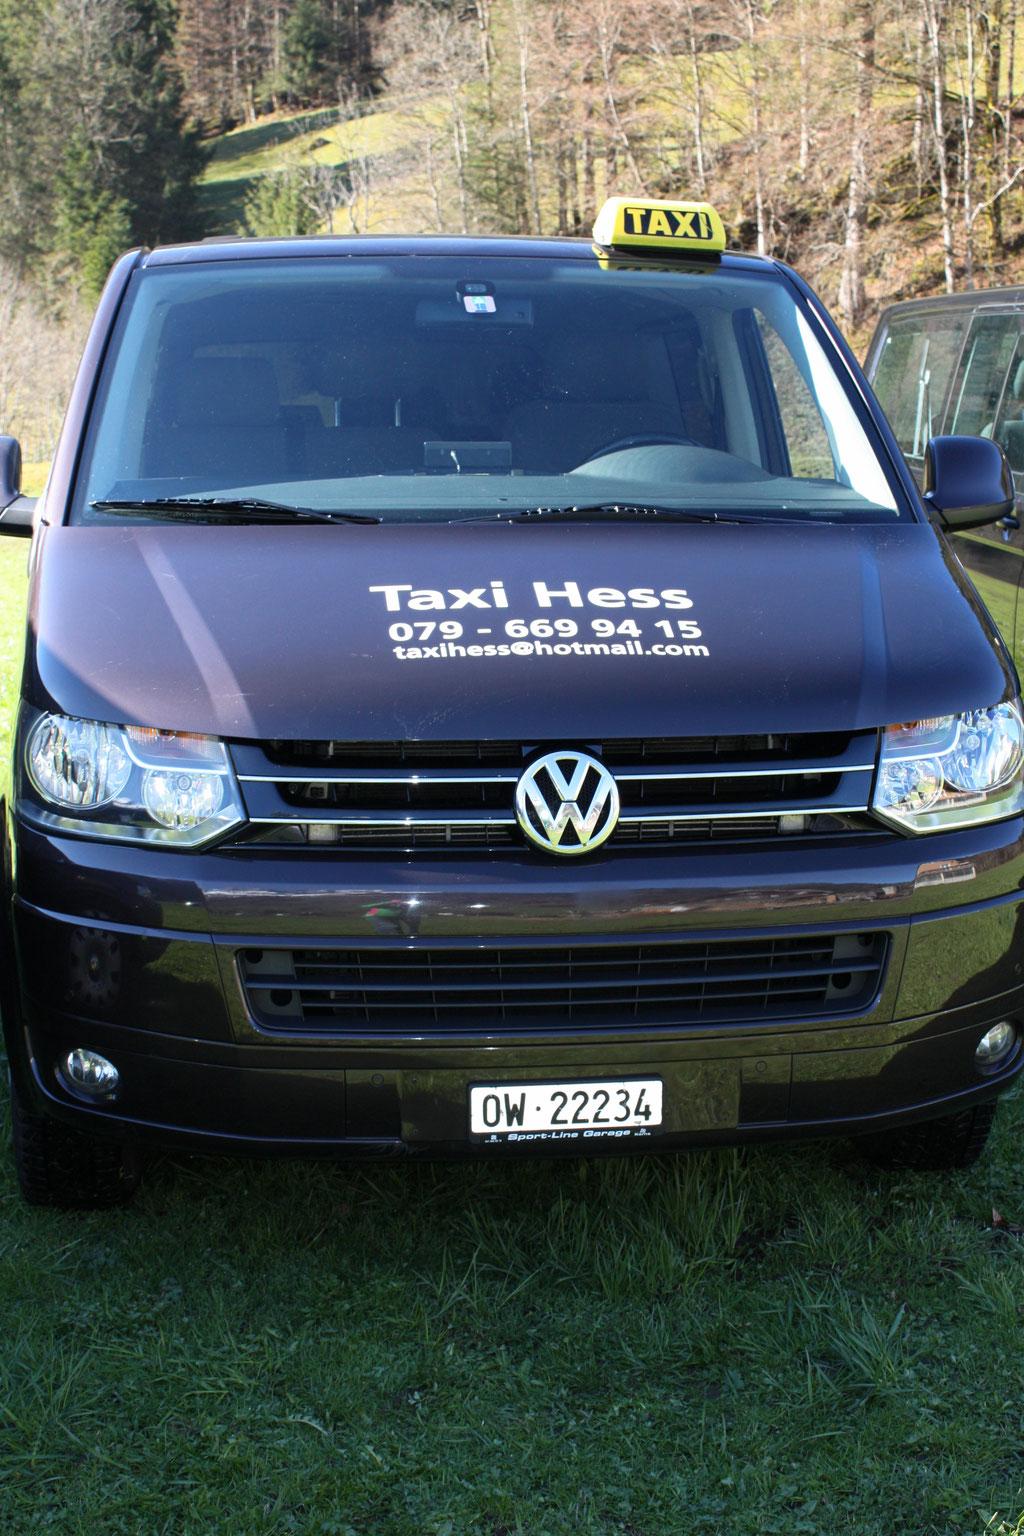 VW T5 in brown